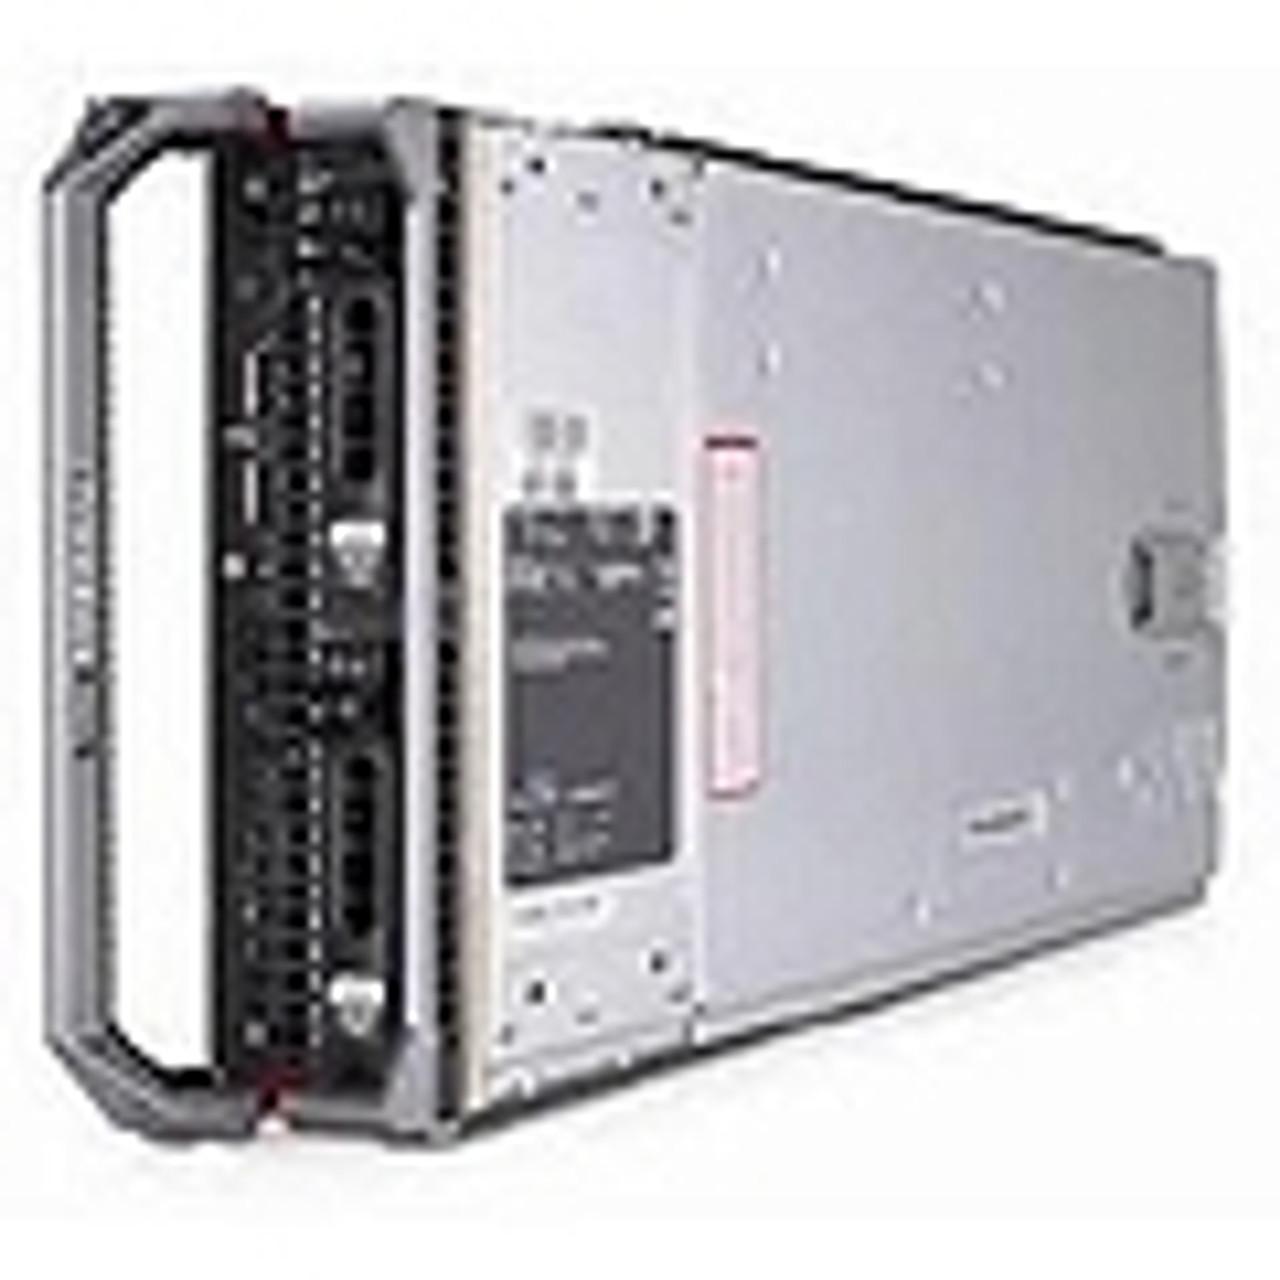 Dell PowerEdge M600 Blade Servers